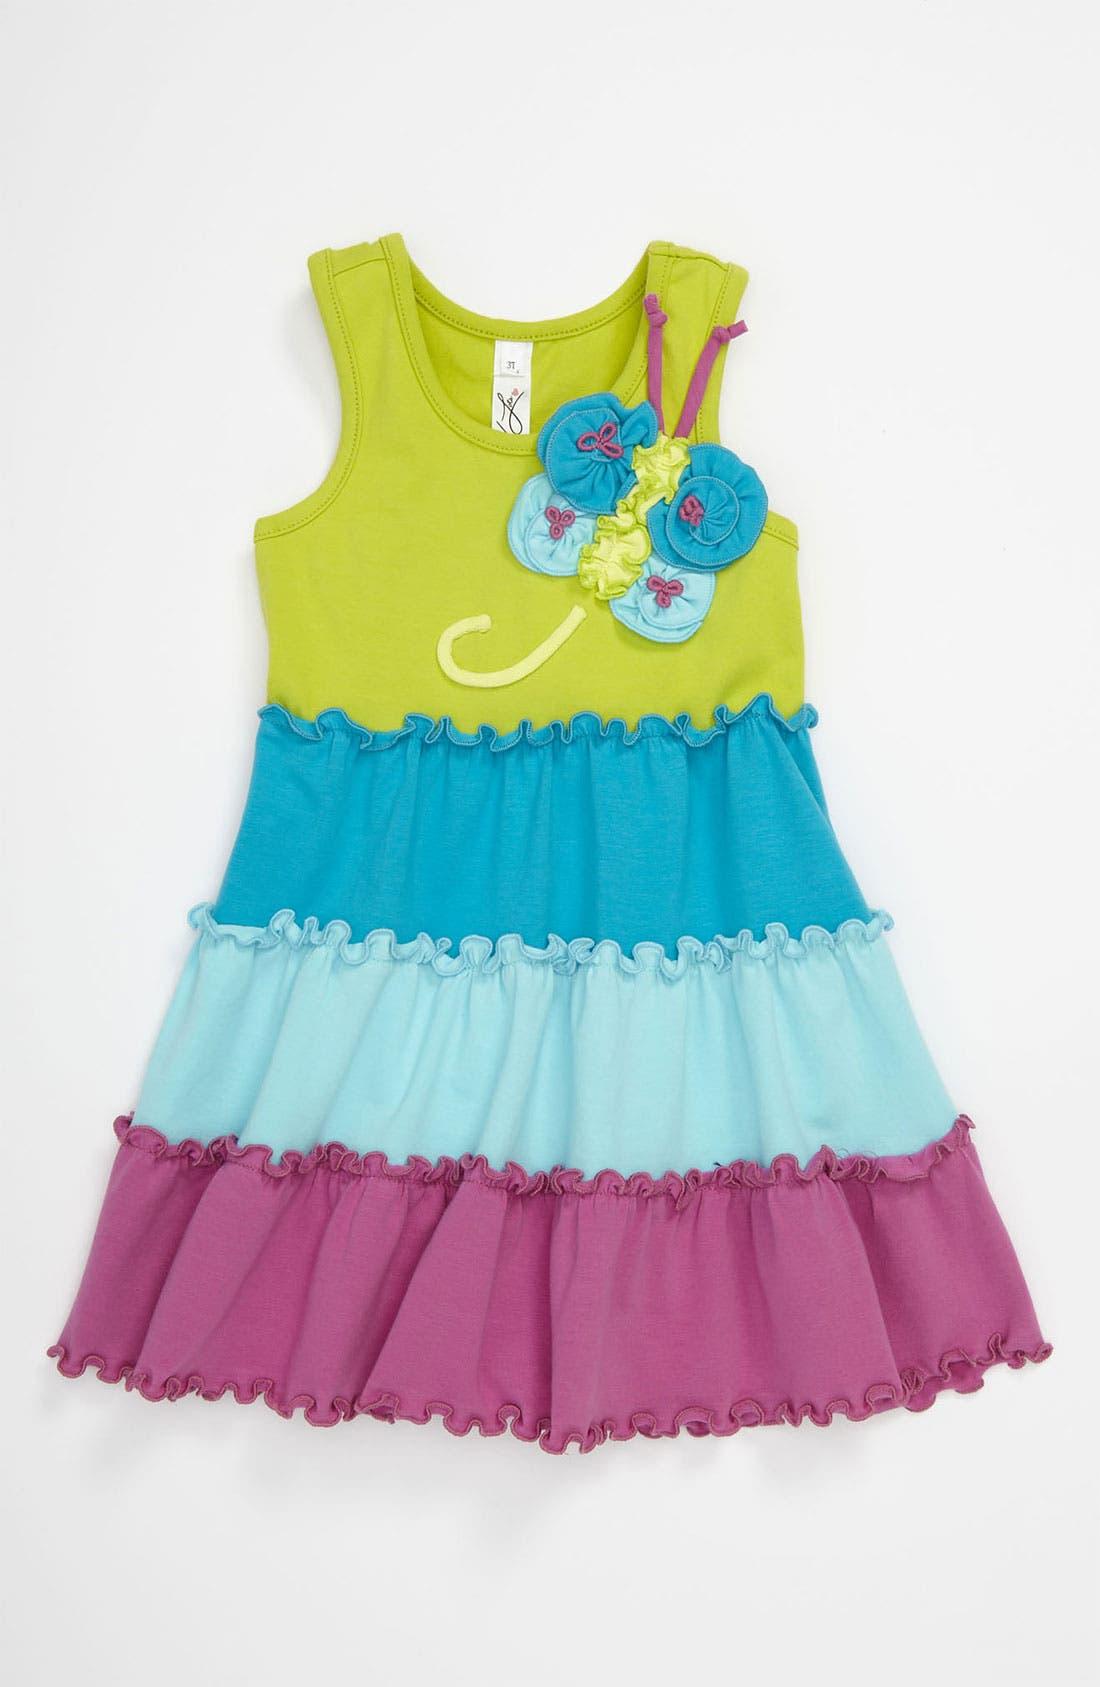 Alternate Image 1 Selected - Love U Lots 'Flower Butterfly' Dress (Toddler)